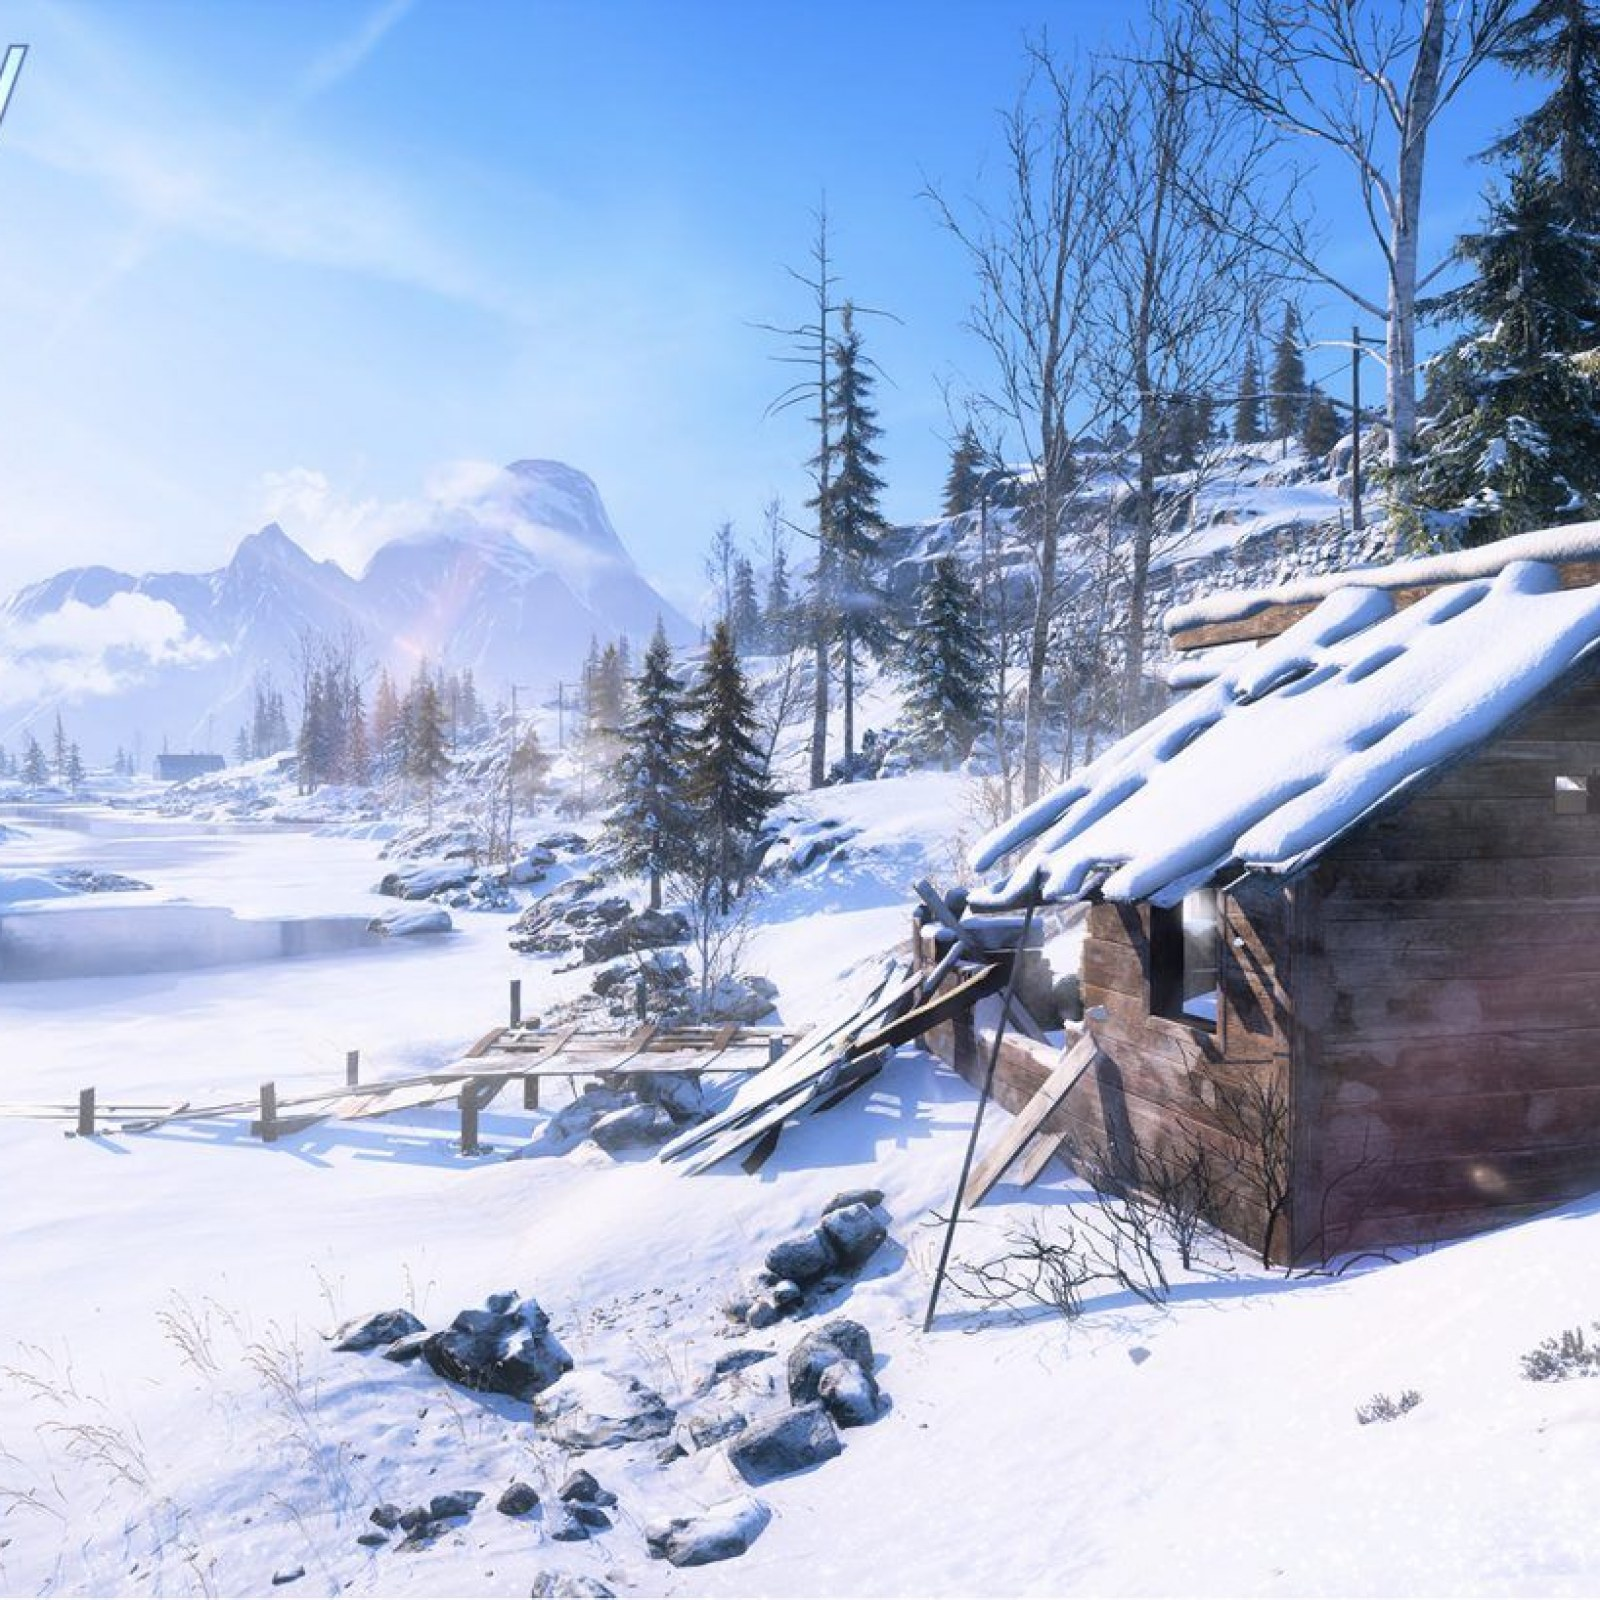 Battlefield 5' Update 1 14 Fixes Firestorm, Adds Microtransactions